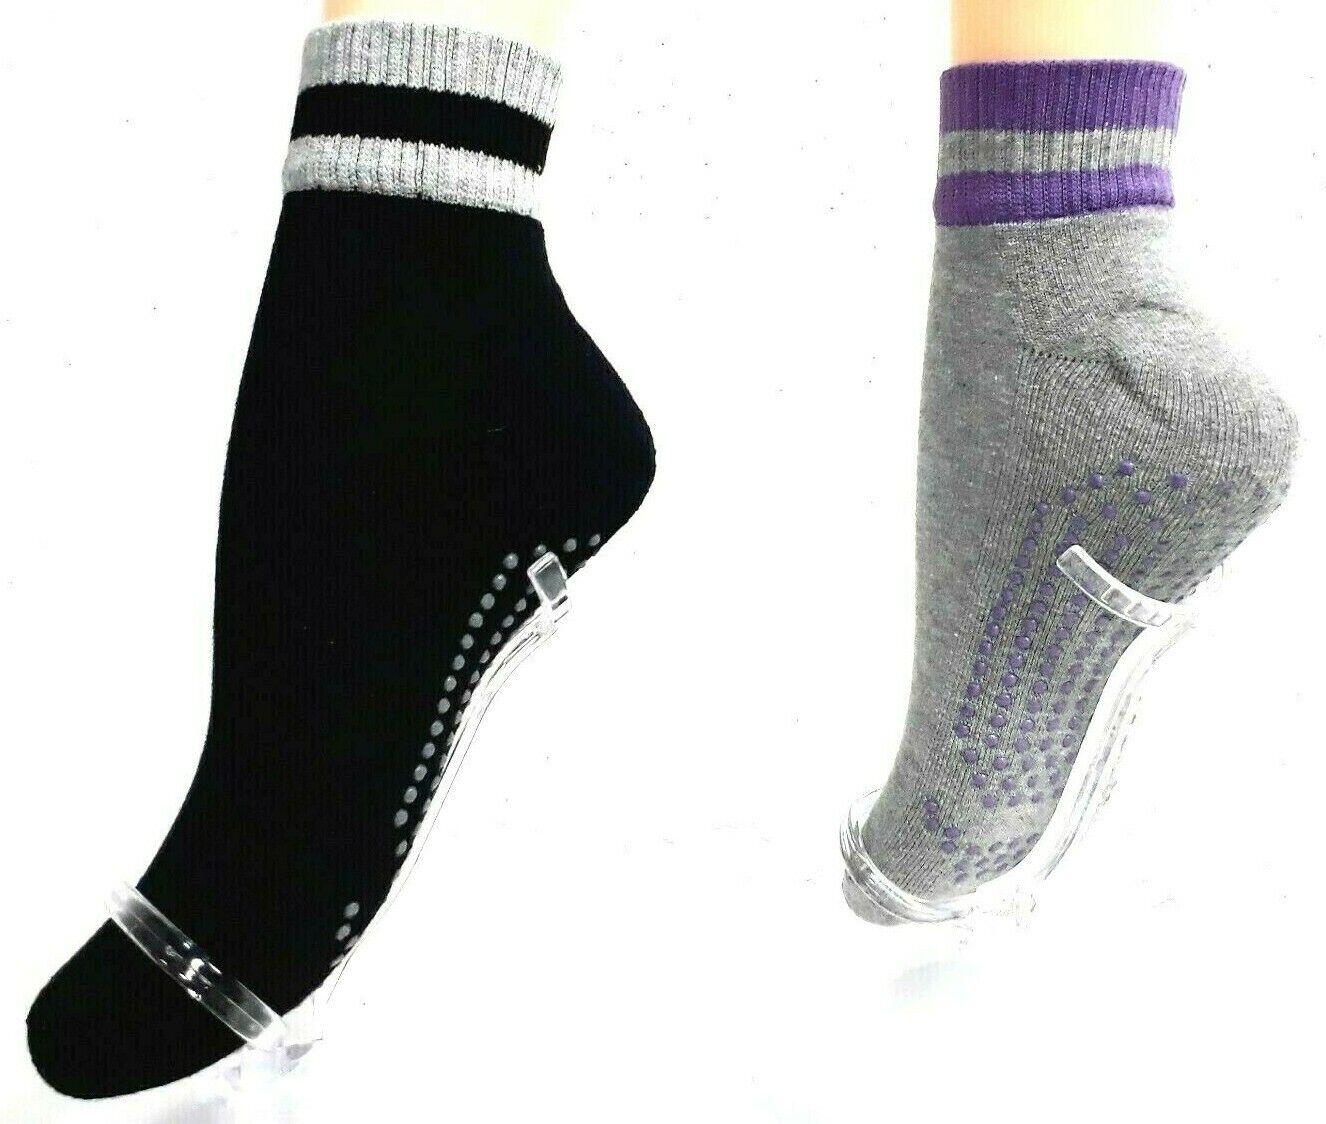 2 Paar Damen Yoga-Wellness Socken, Gr. 35-42, Baumwolle